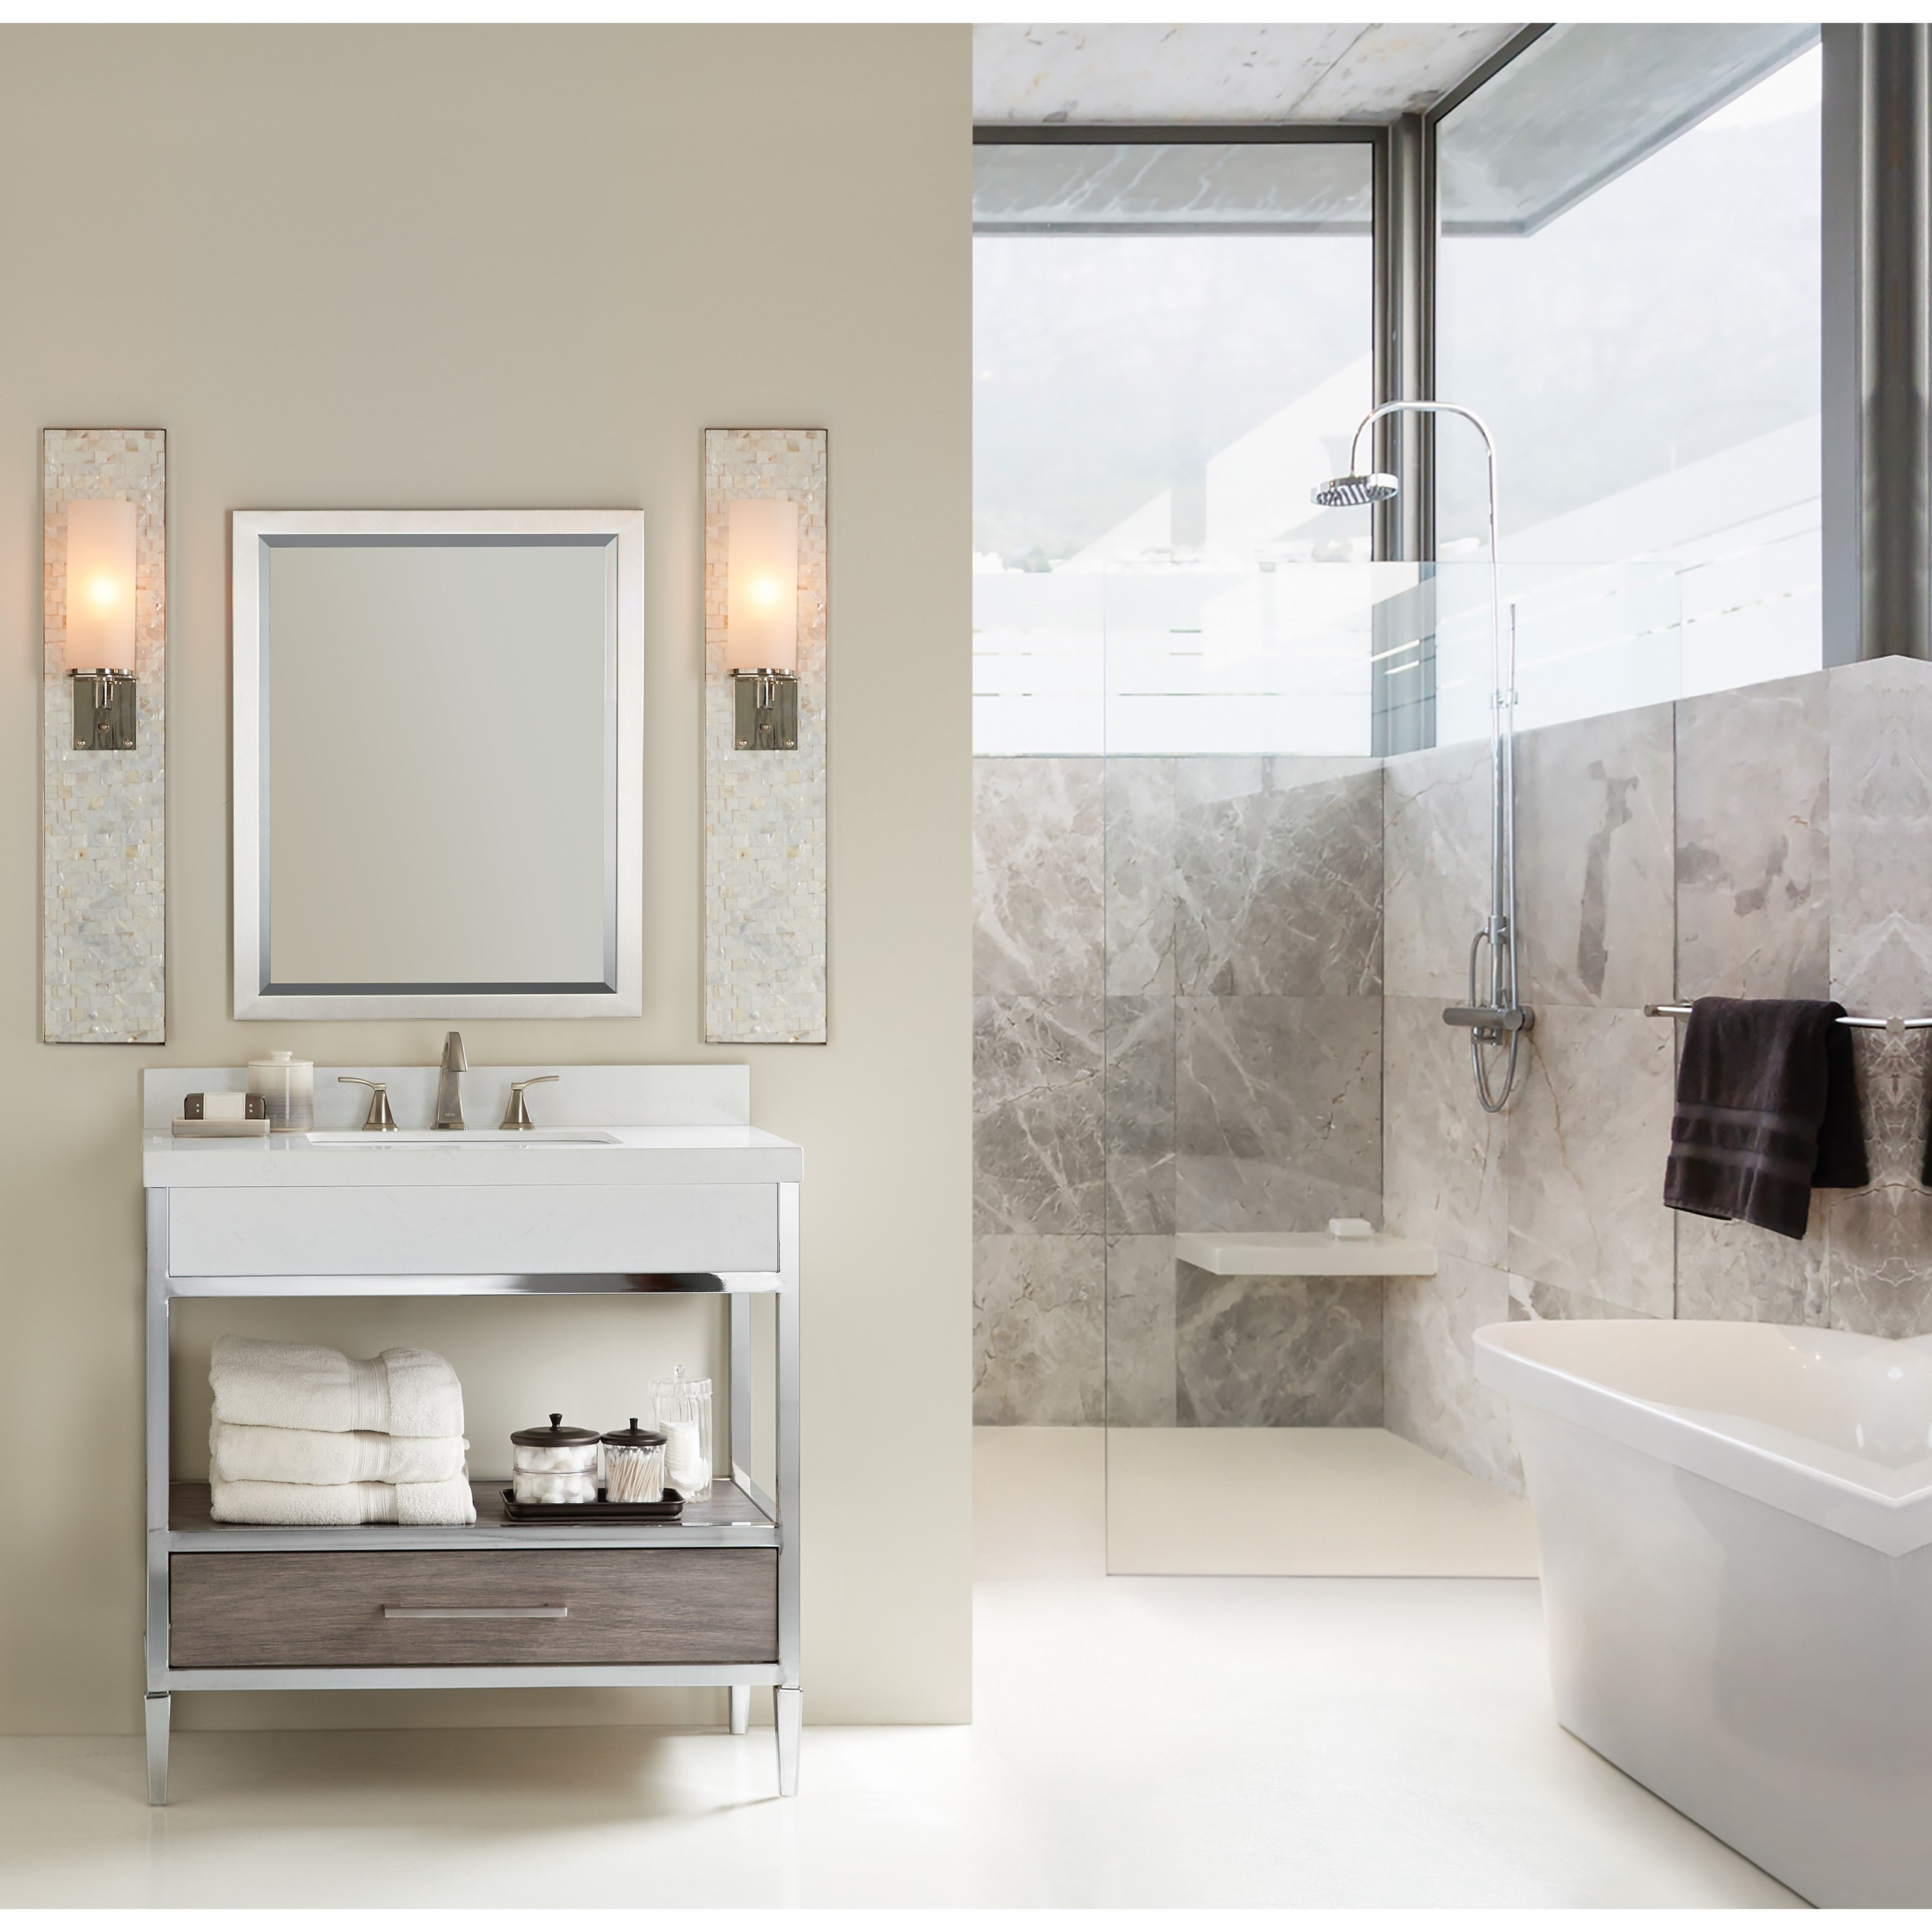 Hooker Furniture Bathroom Vanities Mansfield Contemporary